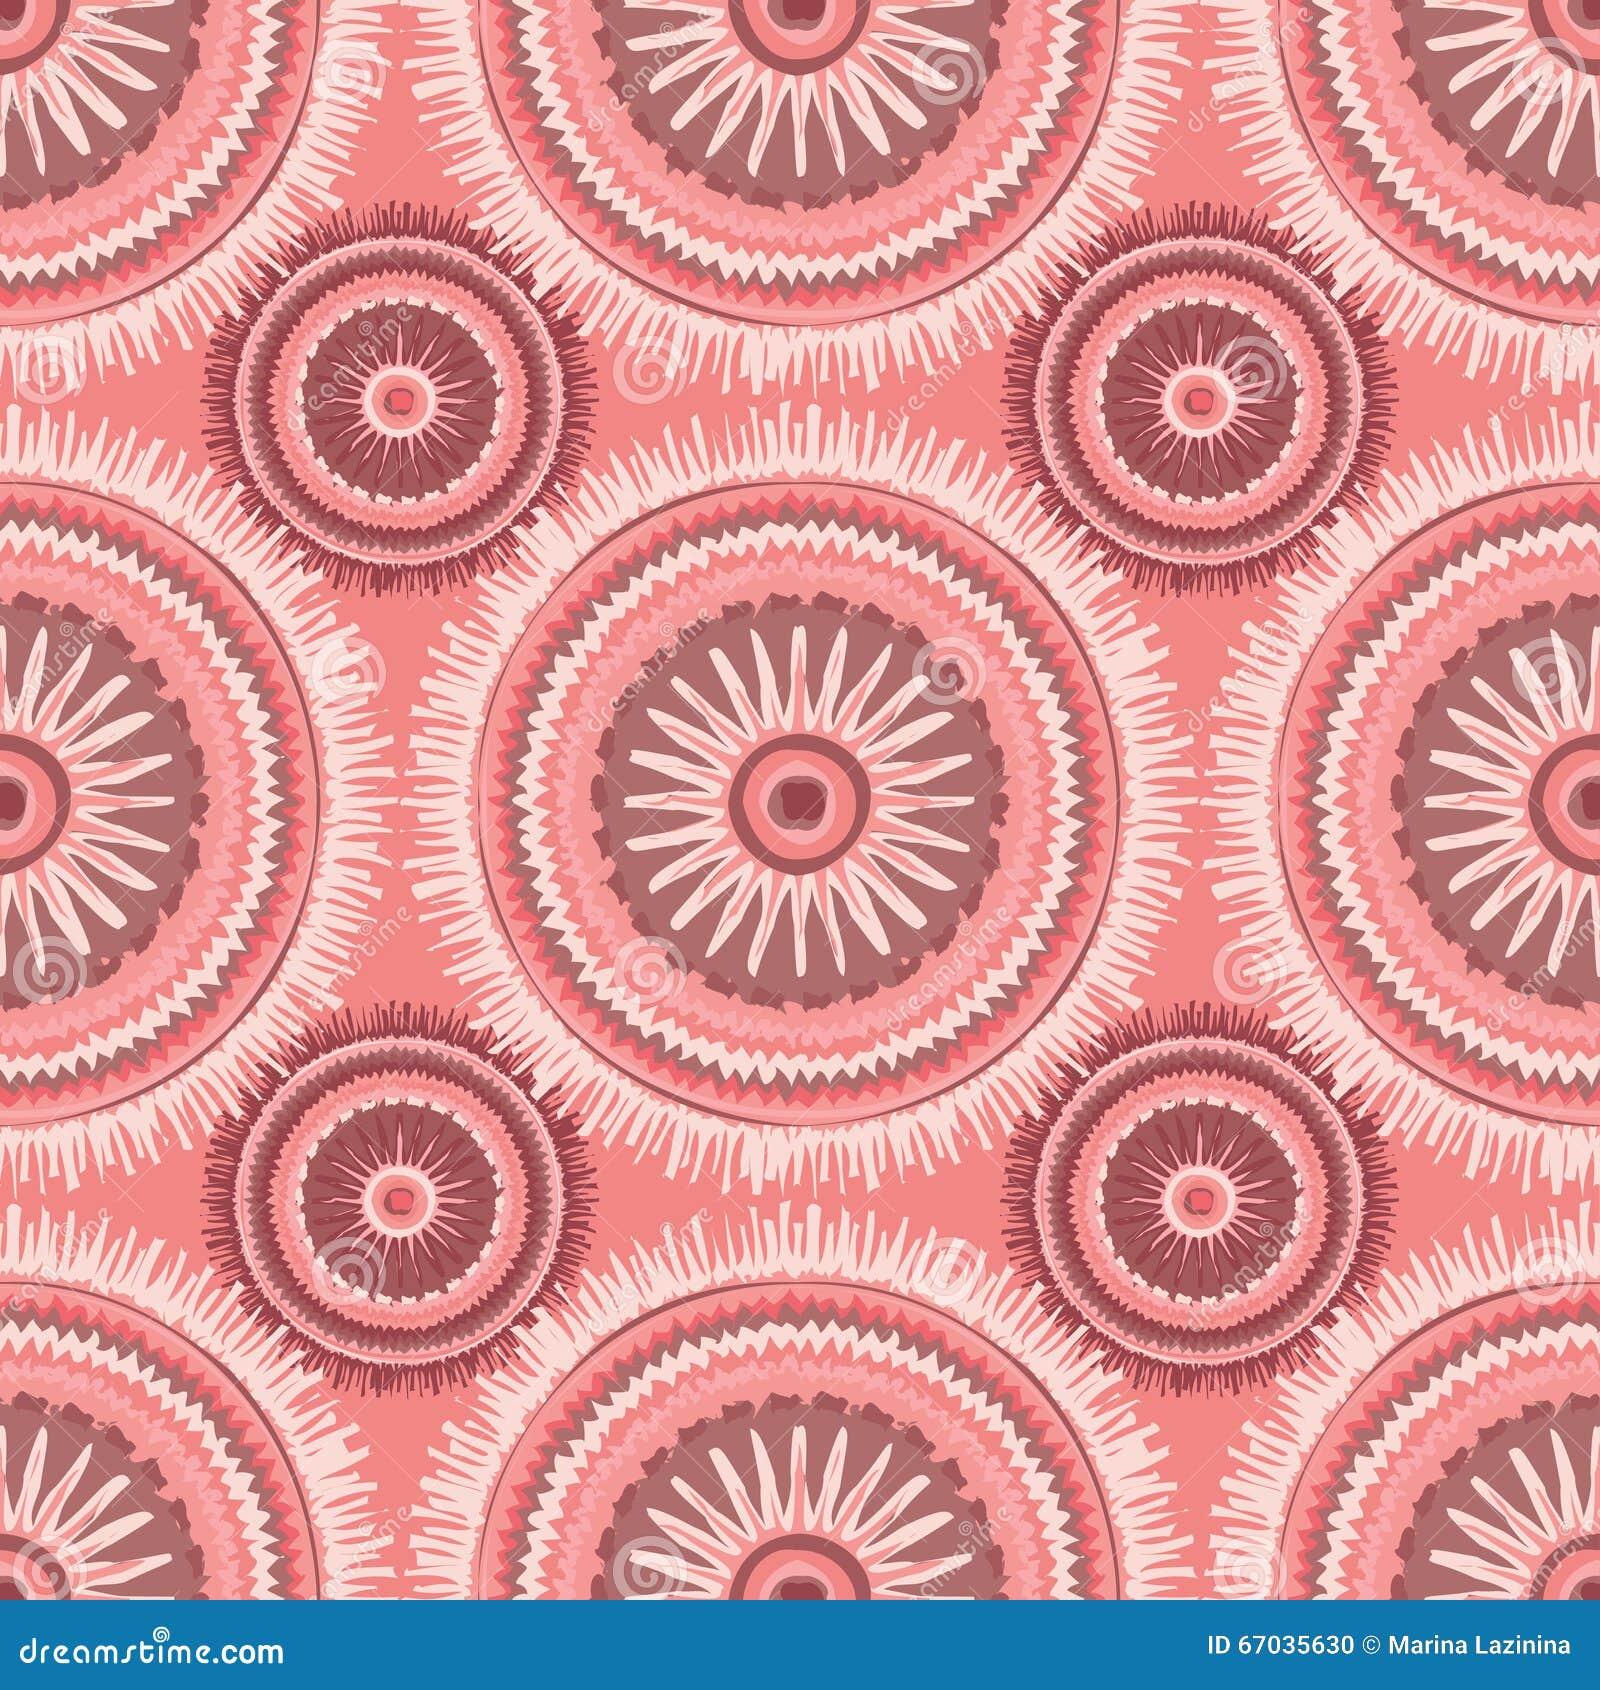 Design On Cloth   Ethnic Boho Seamless Pattern Print Repeating Background Print